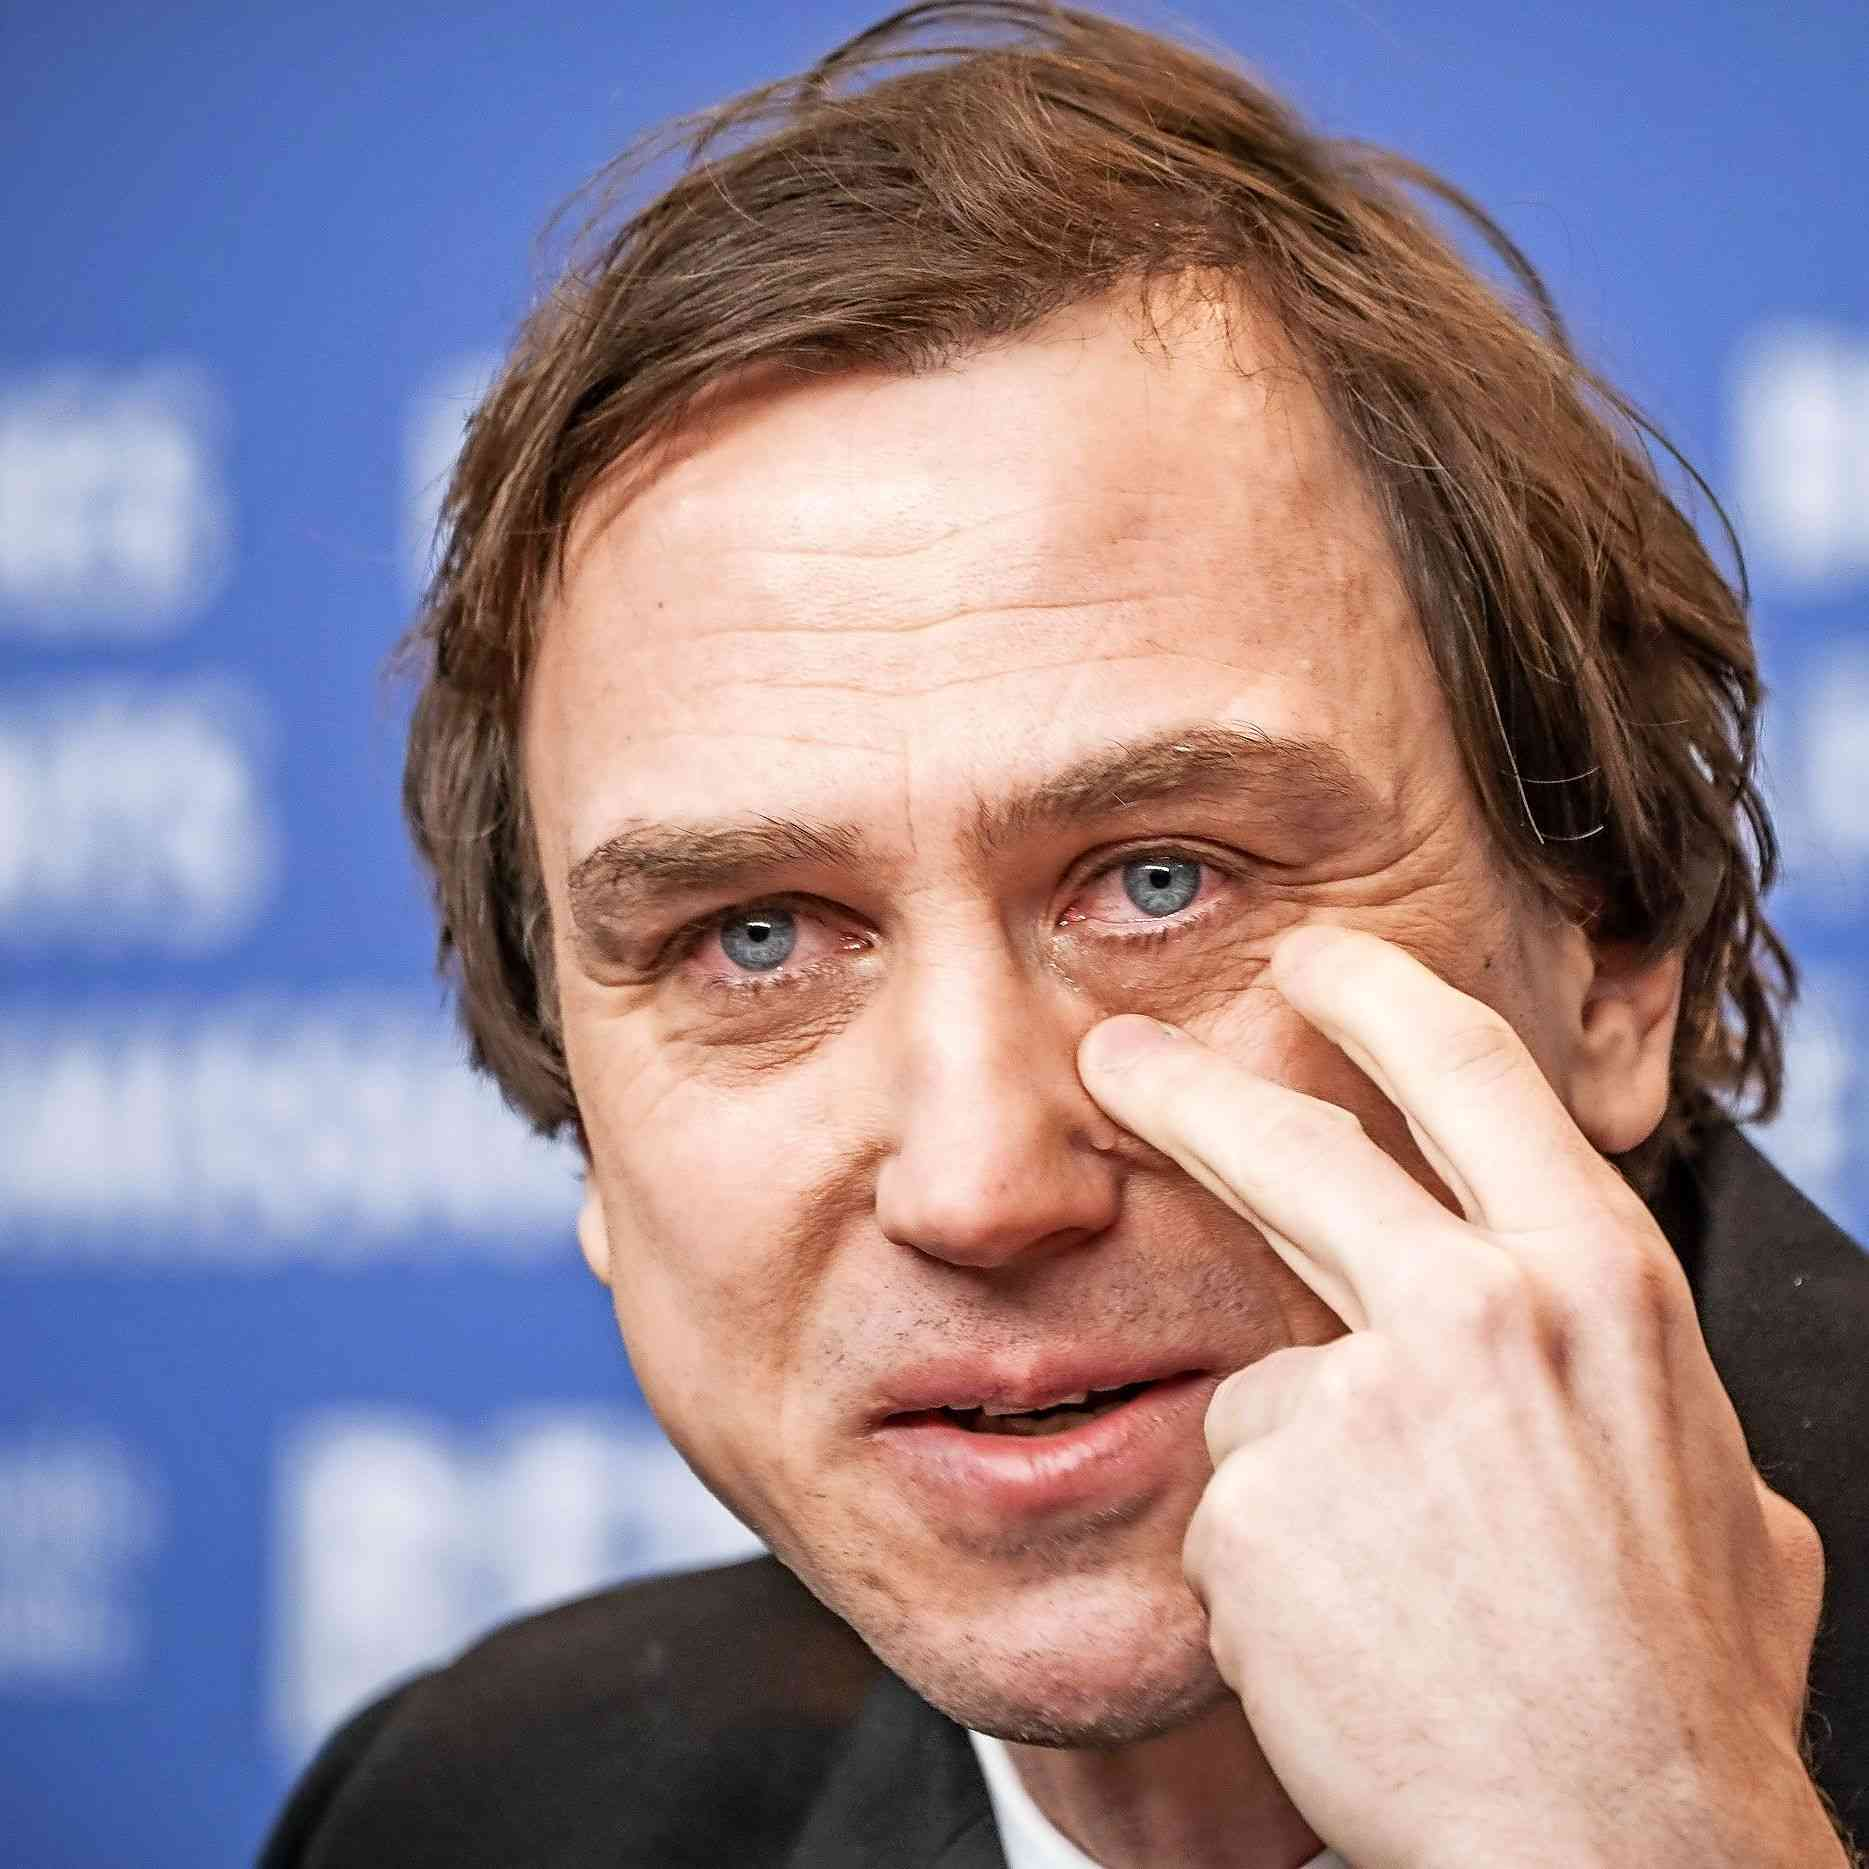 Lars Eidinger Berlinale 2021